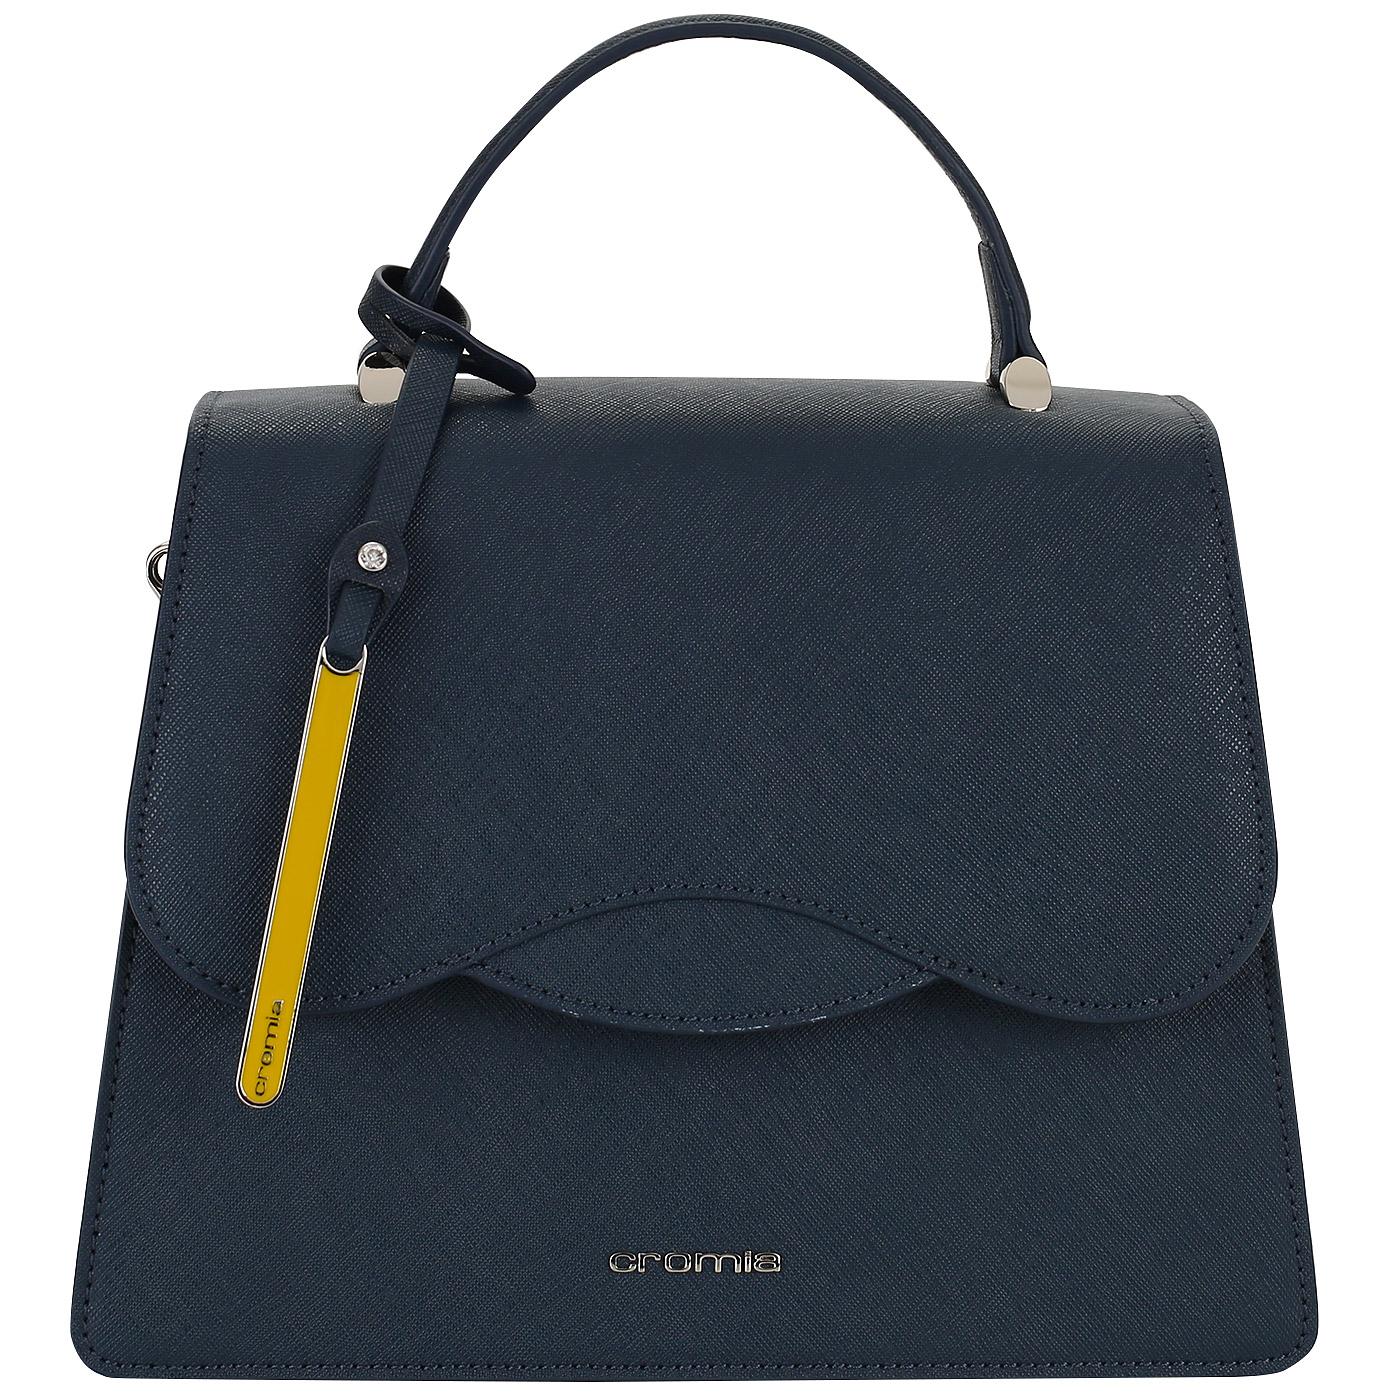 6b8b305da995 Кожаная сумка с плечевым ремешком Cromia Perla 1403593_blu ...